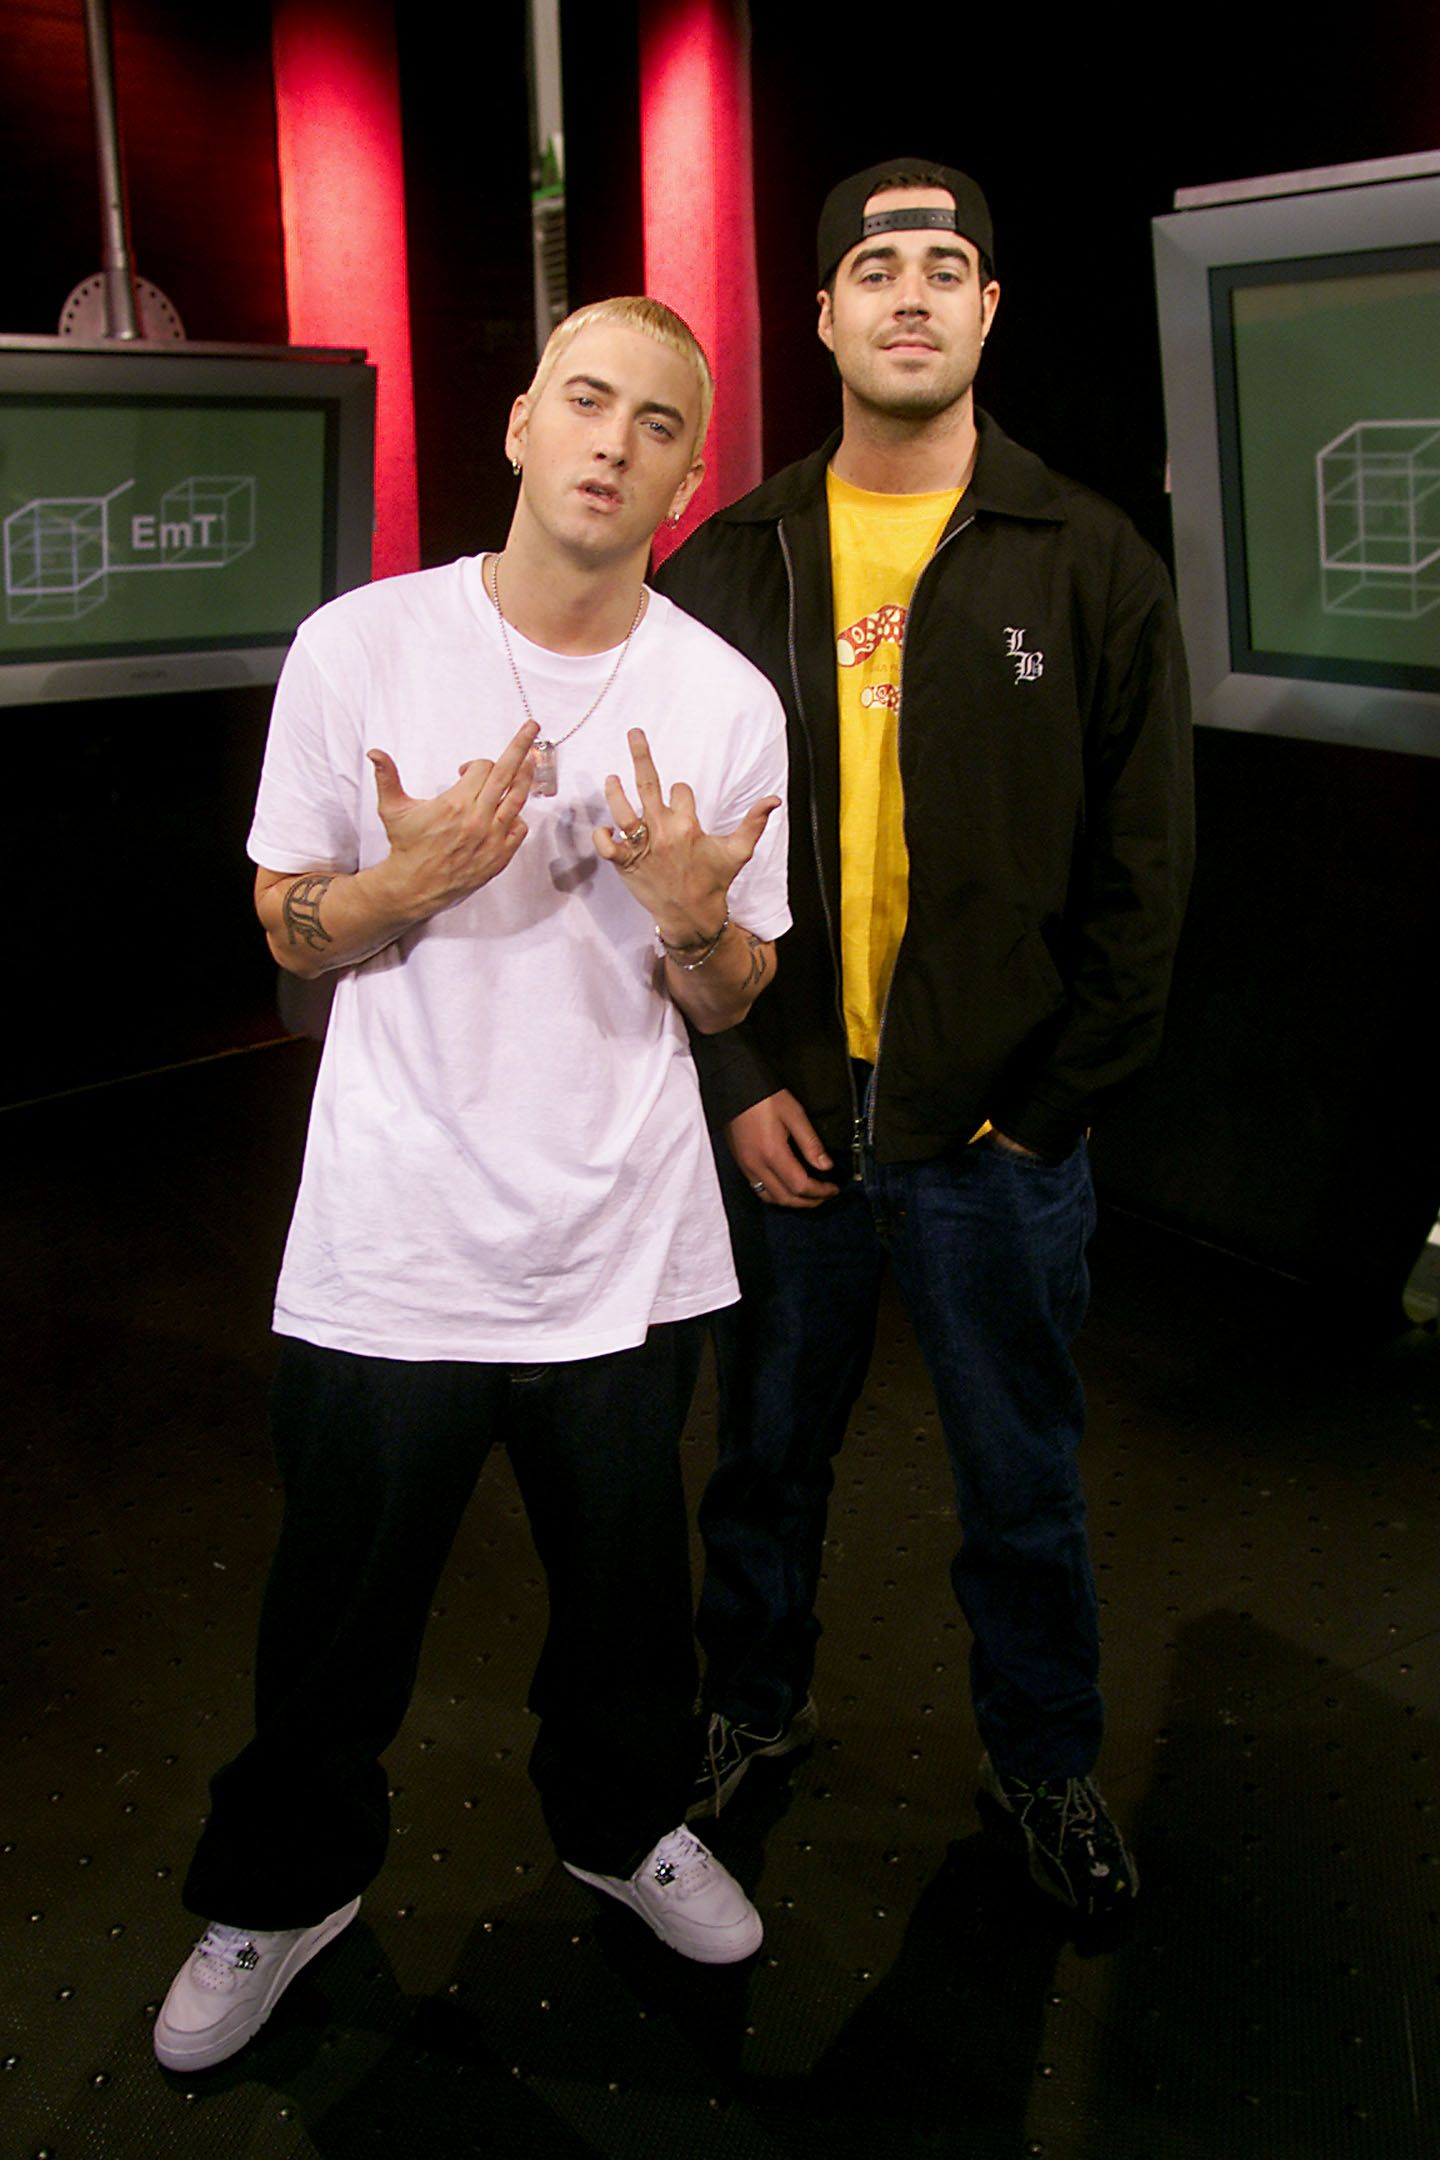 Eminem Calls Britney Spears, *NSYNC and Backstreet Boys 'Trash'